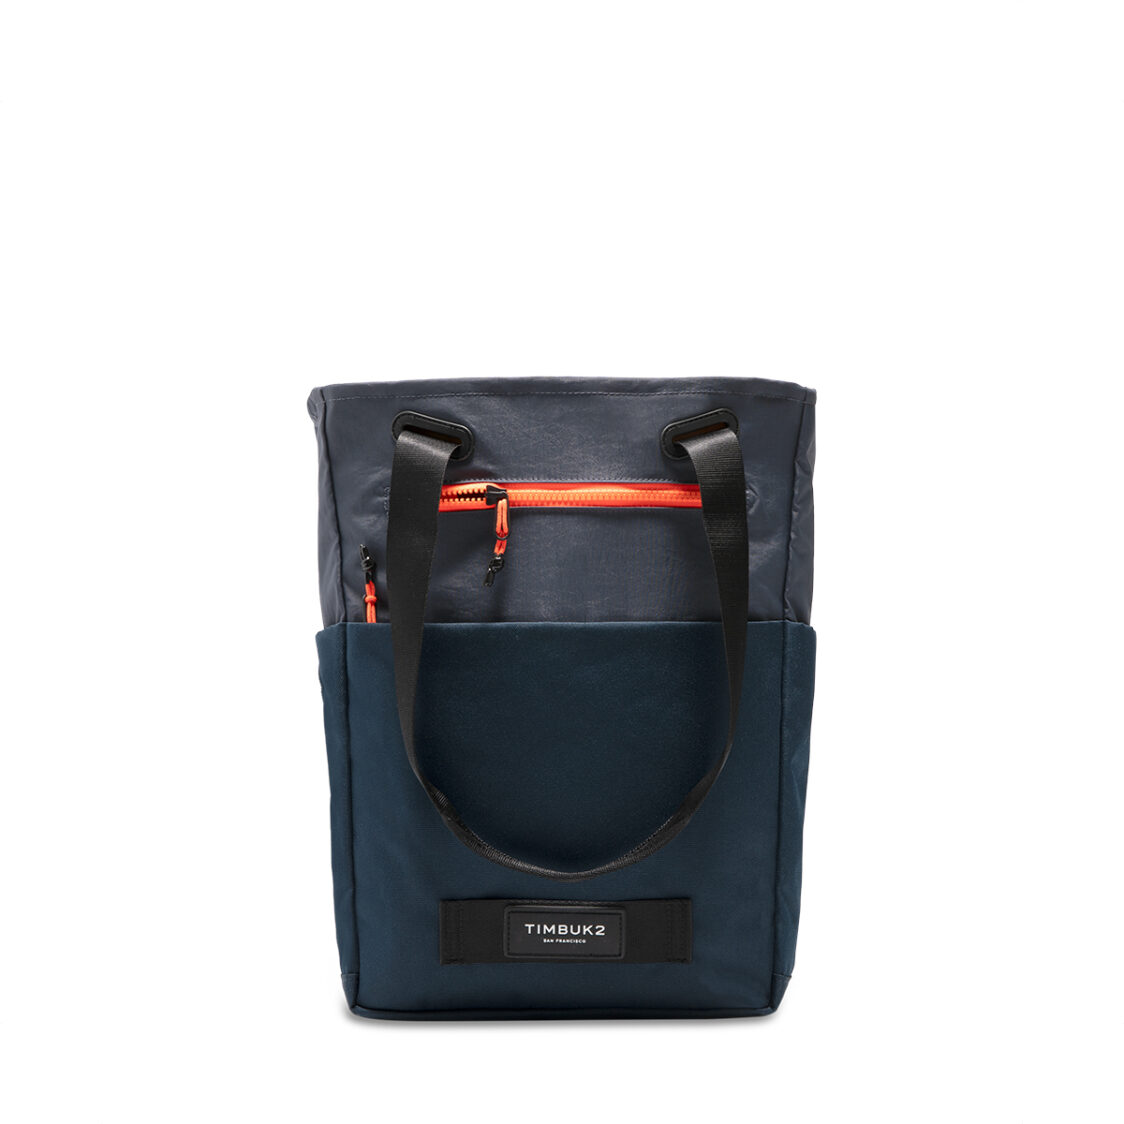 Timbuk2 Scholar Convertible Tote Backpack - Aurora